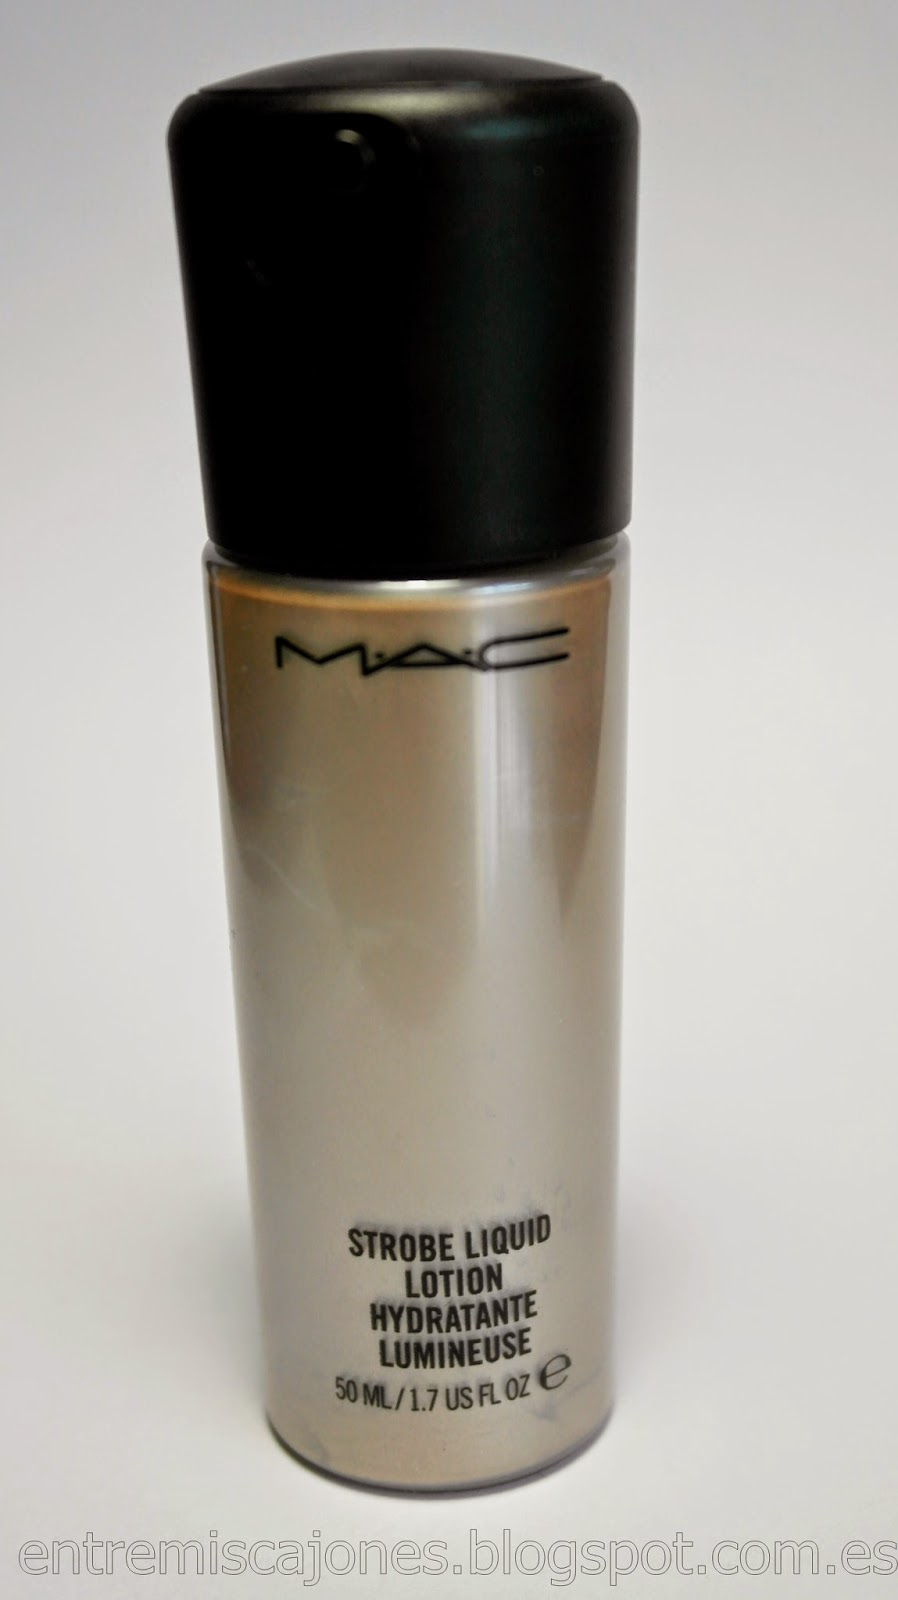 mac strobe liquid lotion hydratante lumineuse how to use